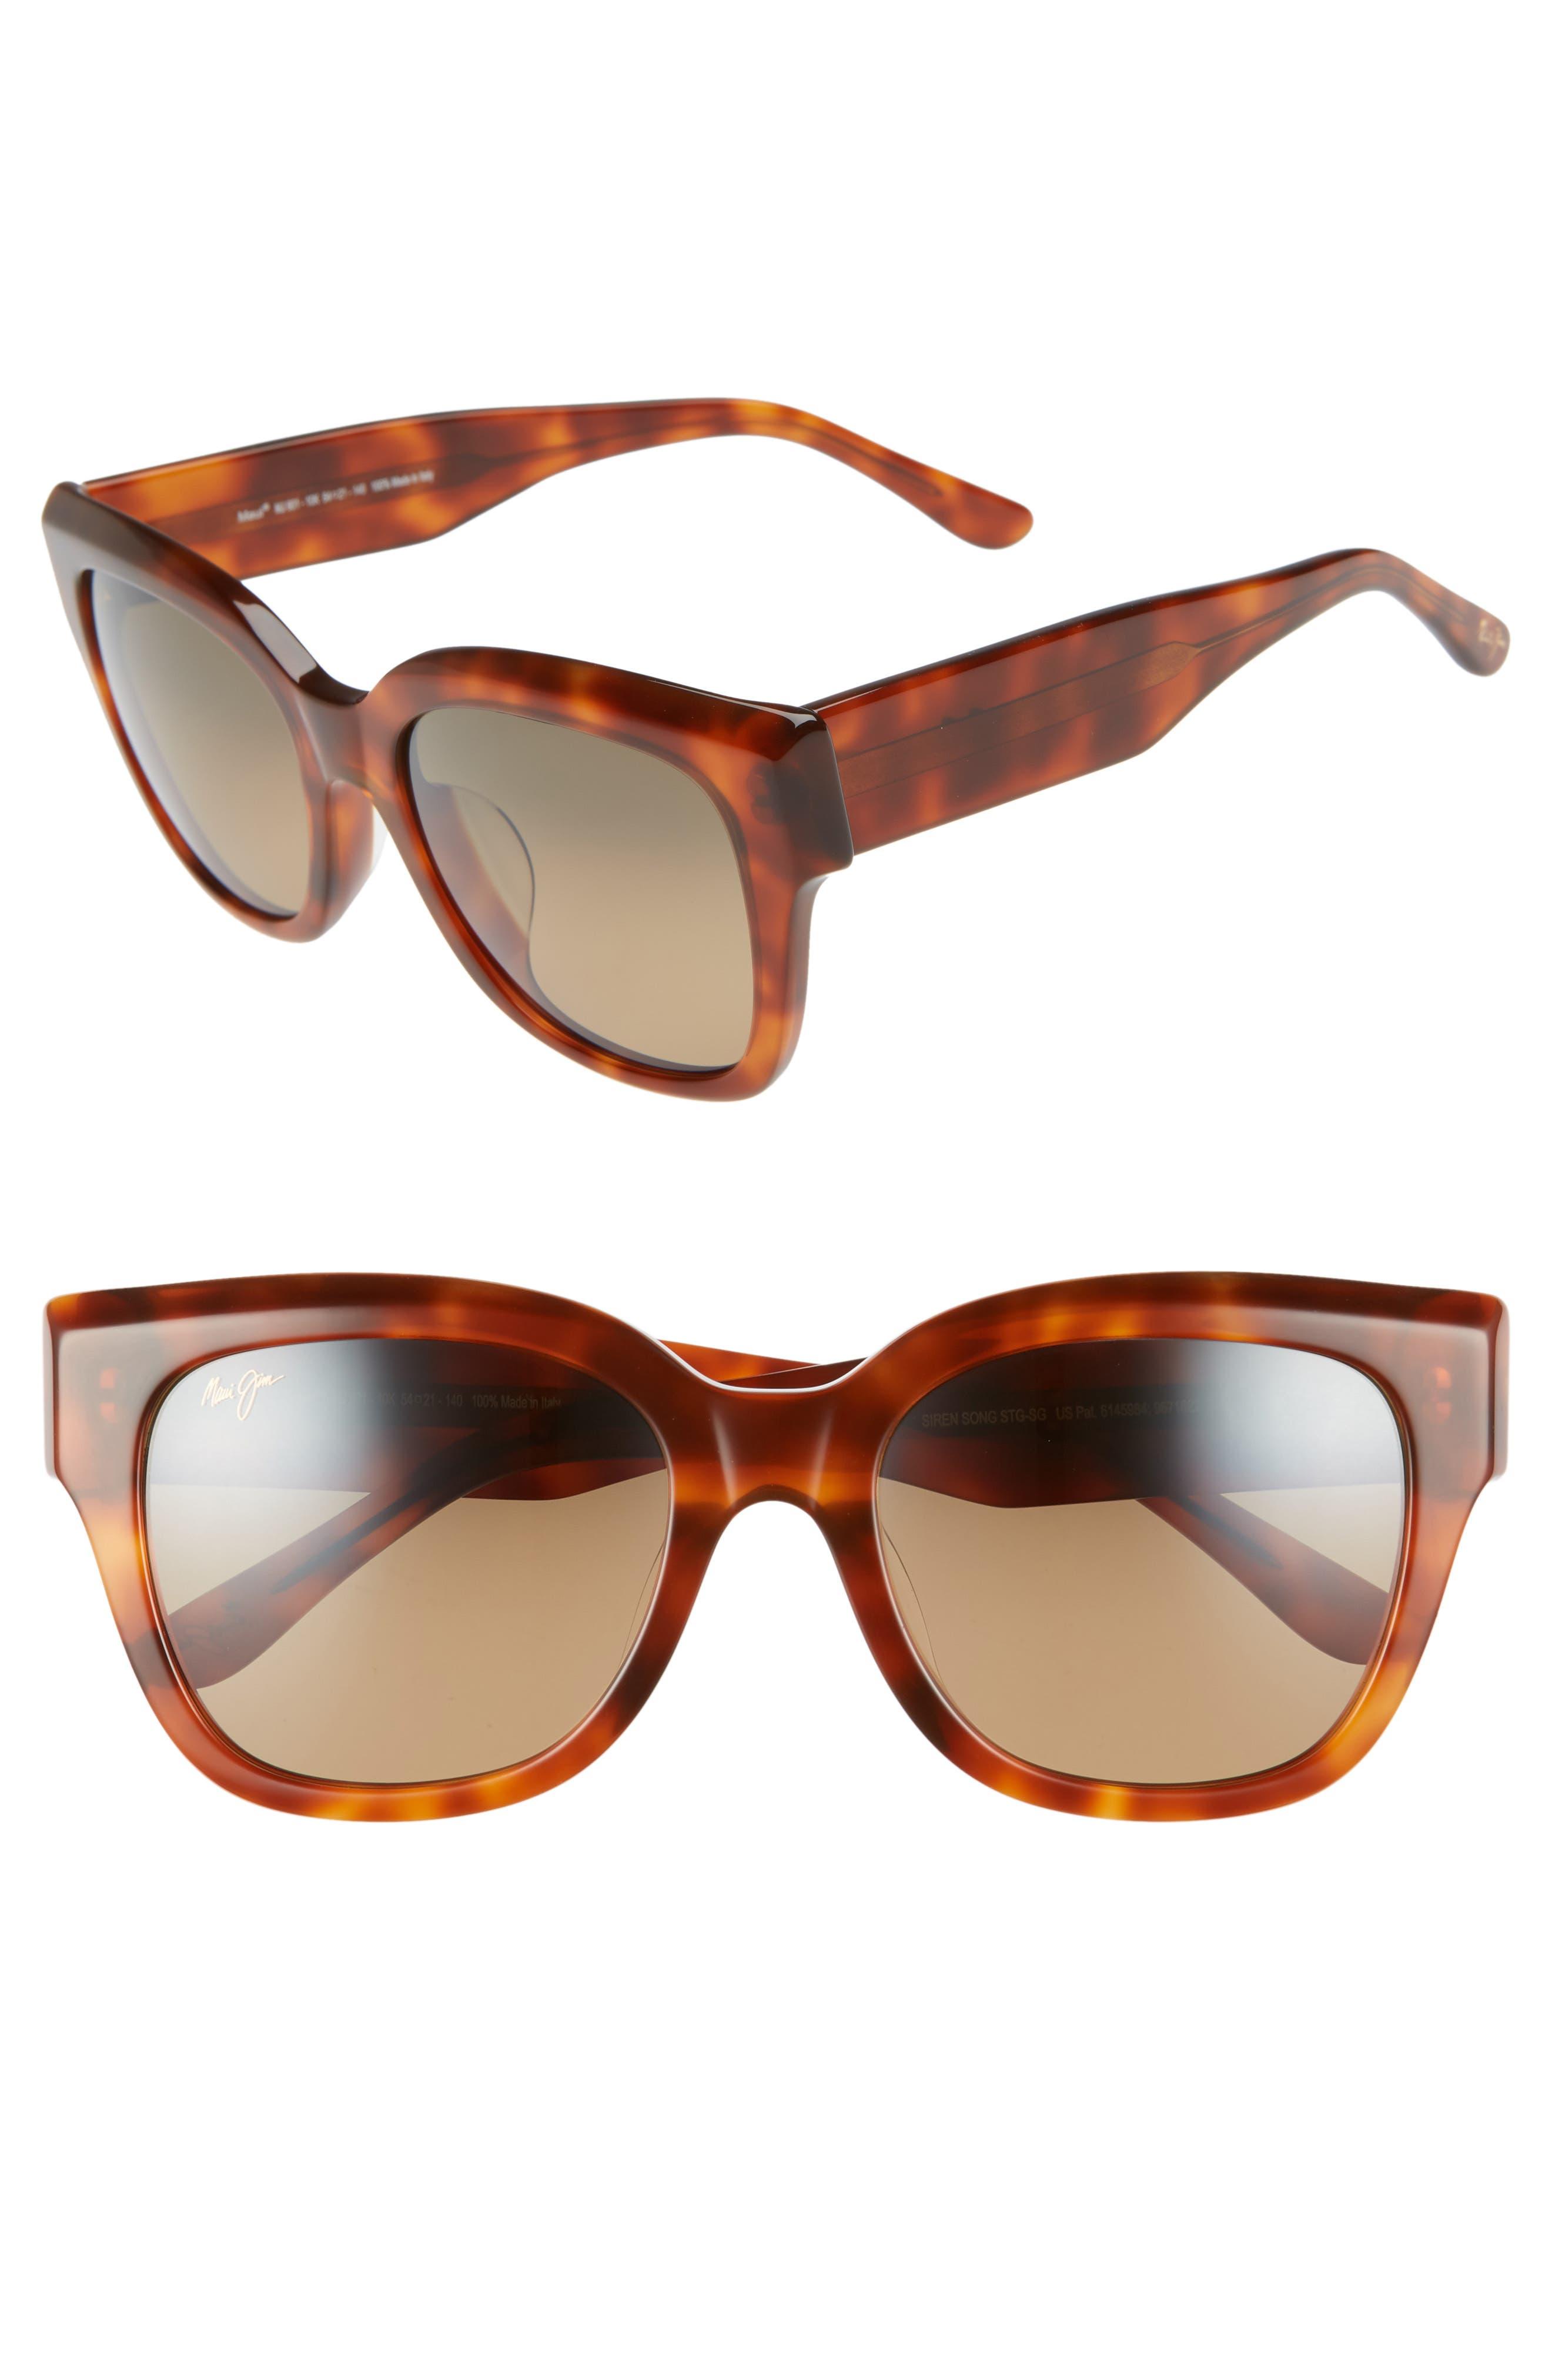 MAUI JIM Siren Song 54Mm Polarizedplus2 Cat Eye Sunglasses - Koa Tortoise